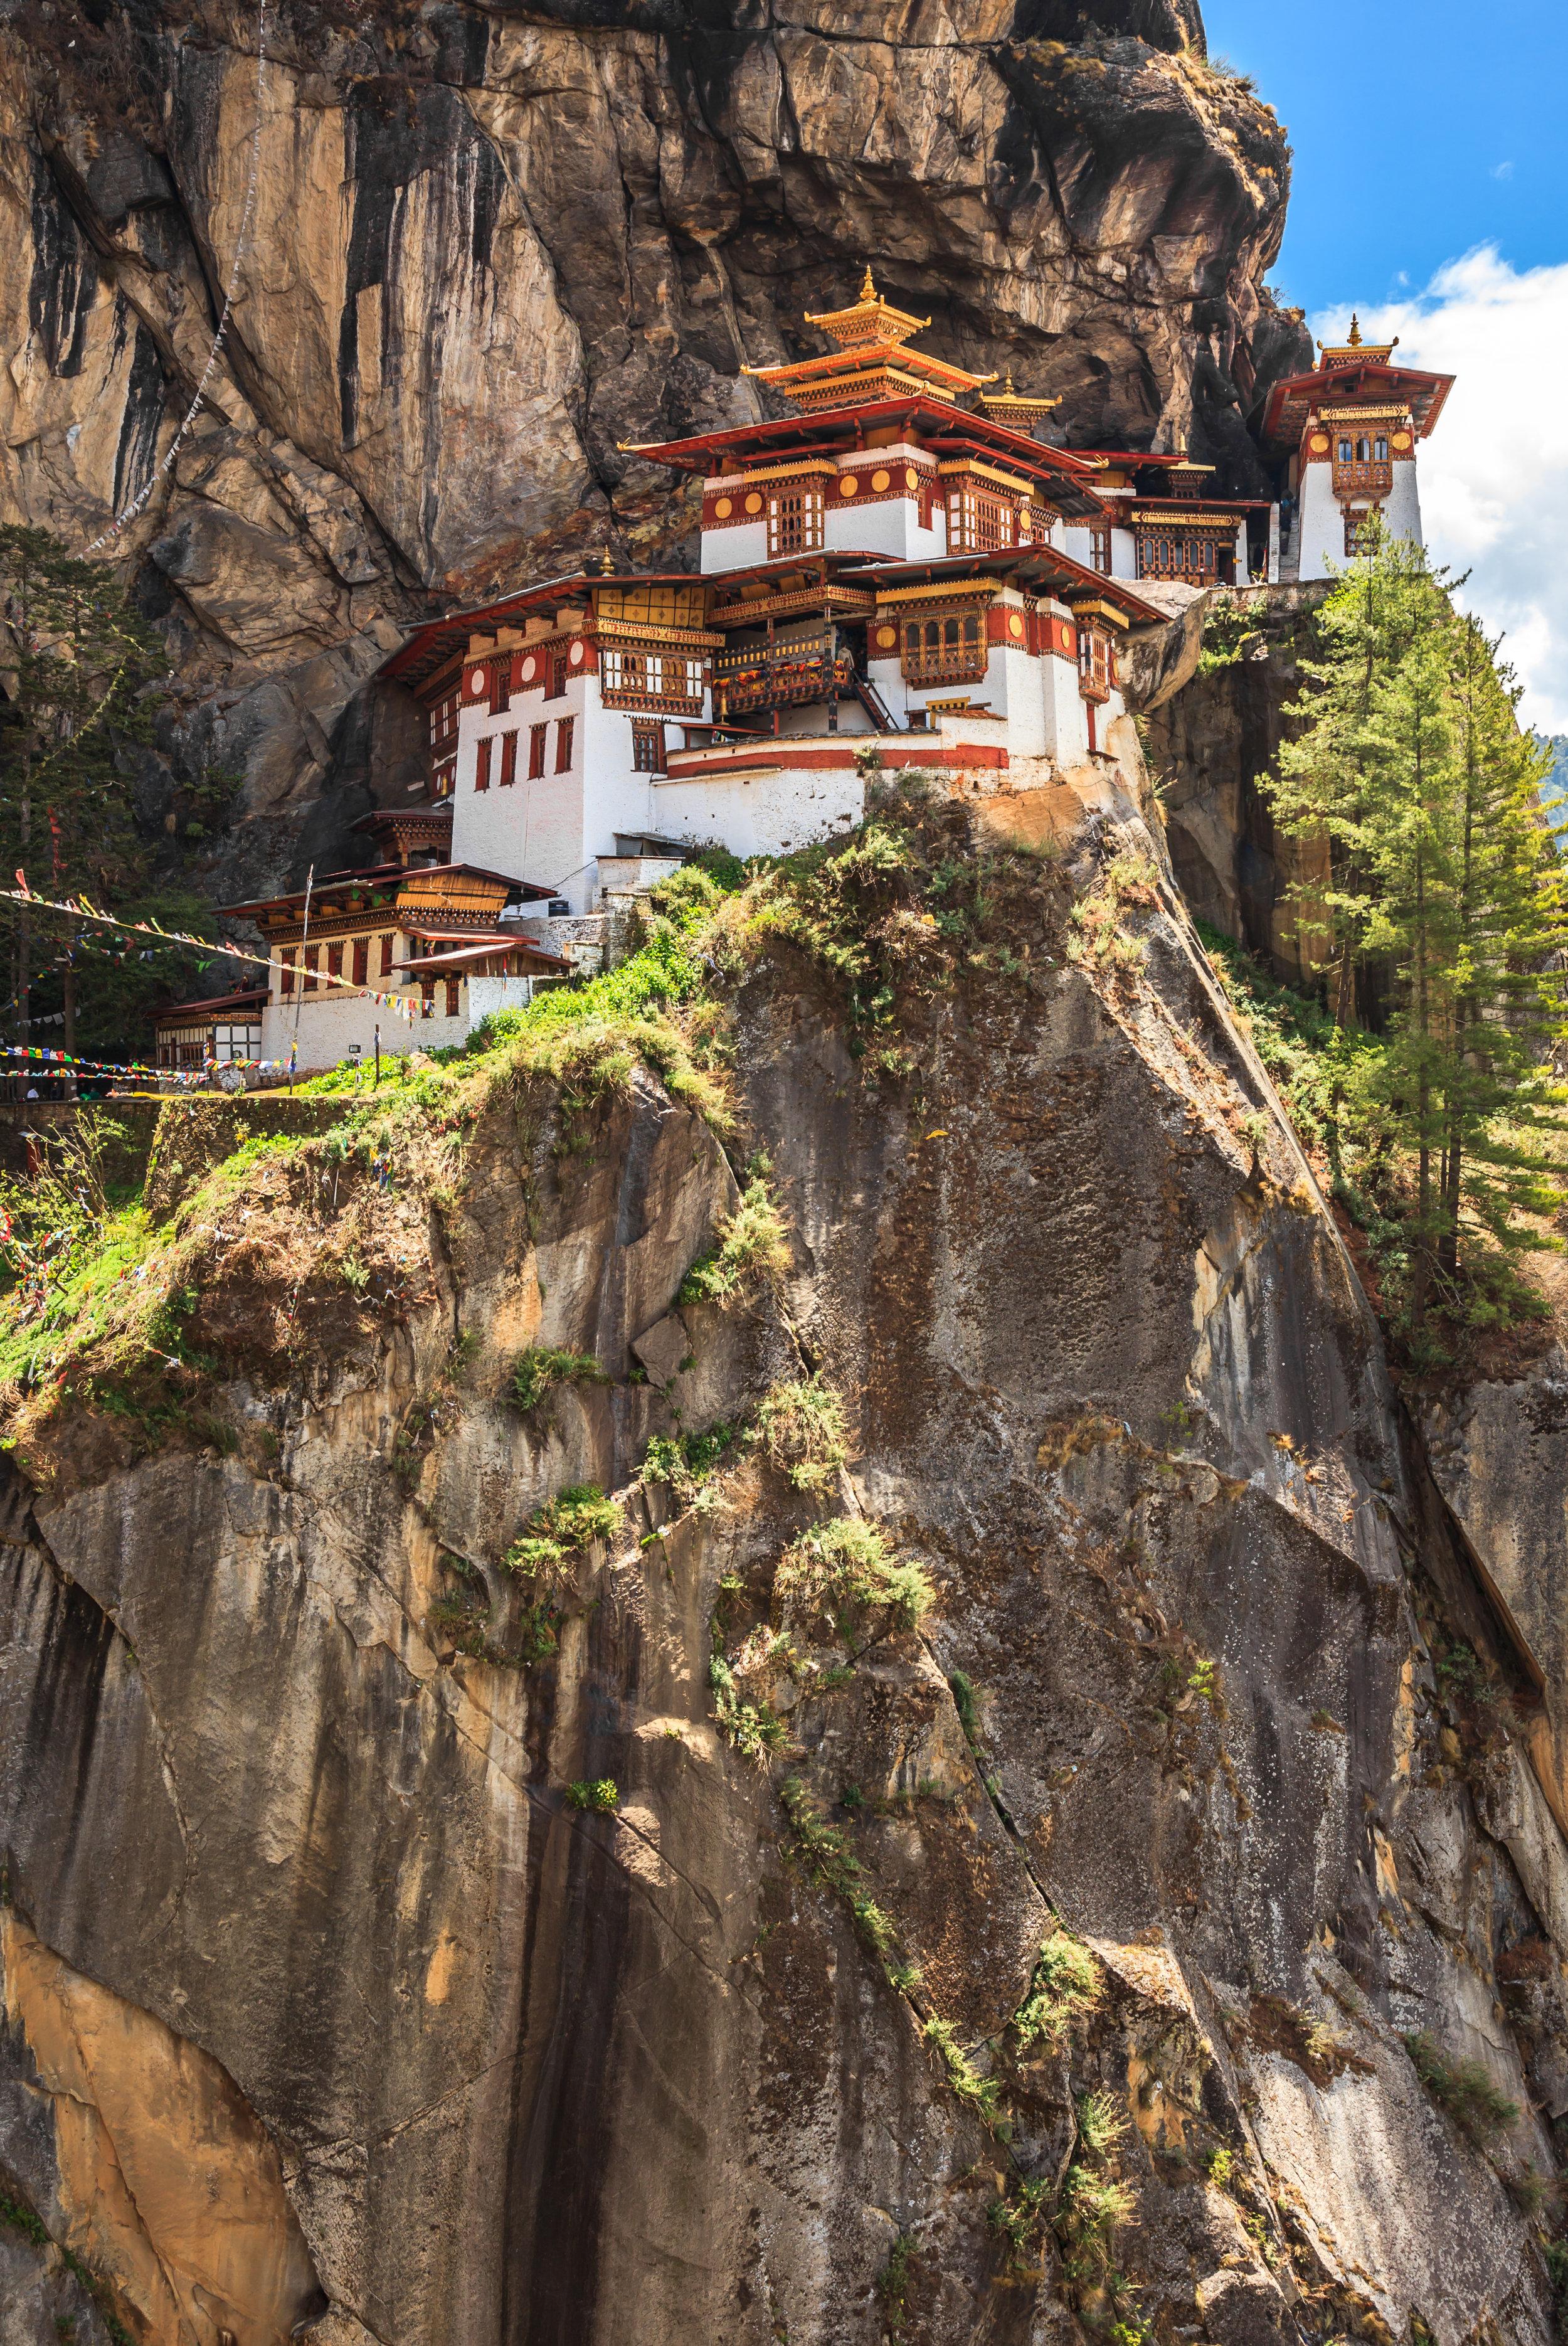 bhutan_bigstock-Taktshang-Goemba-84539774.jpg